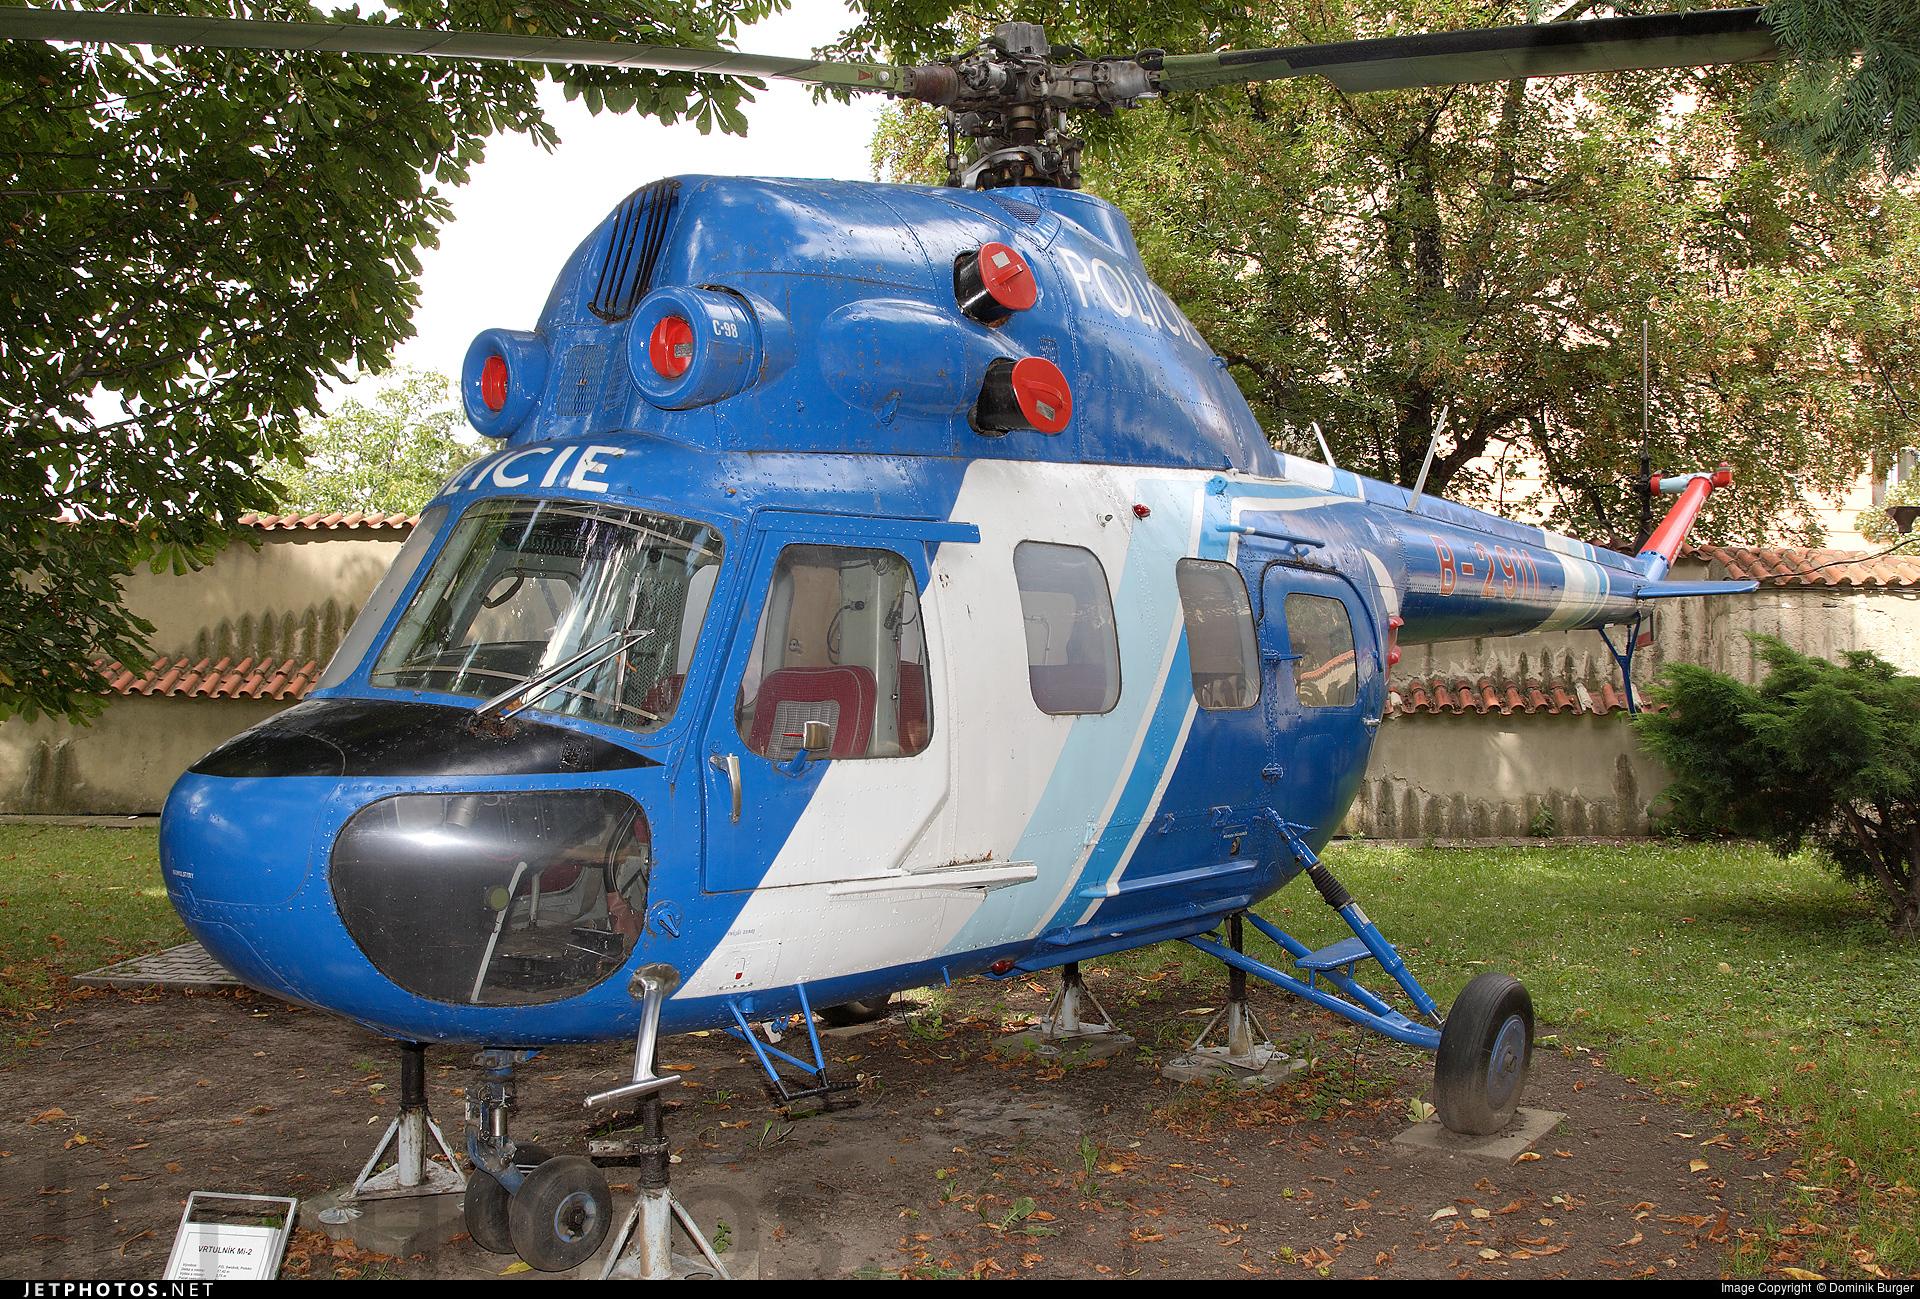 B-2911 - PZL-Swidnik Mi-2 Hoplite - Czech Republic - Police